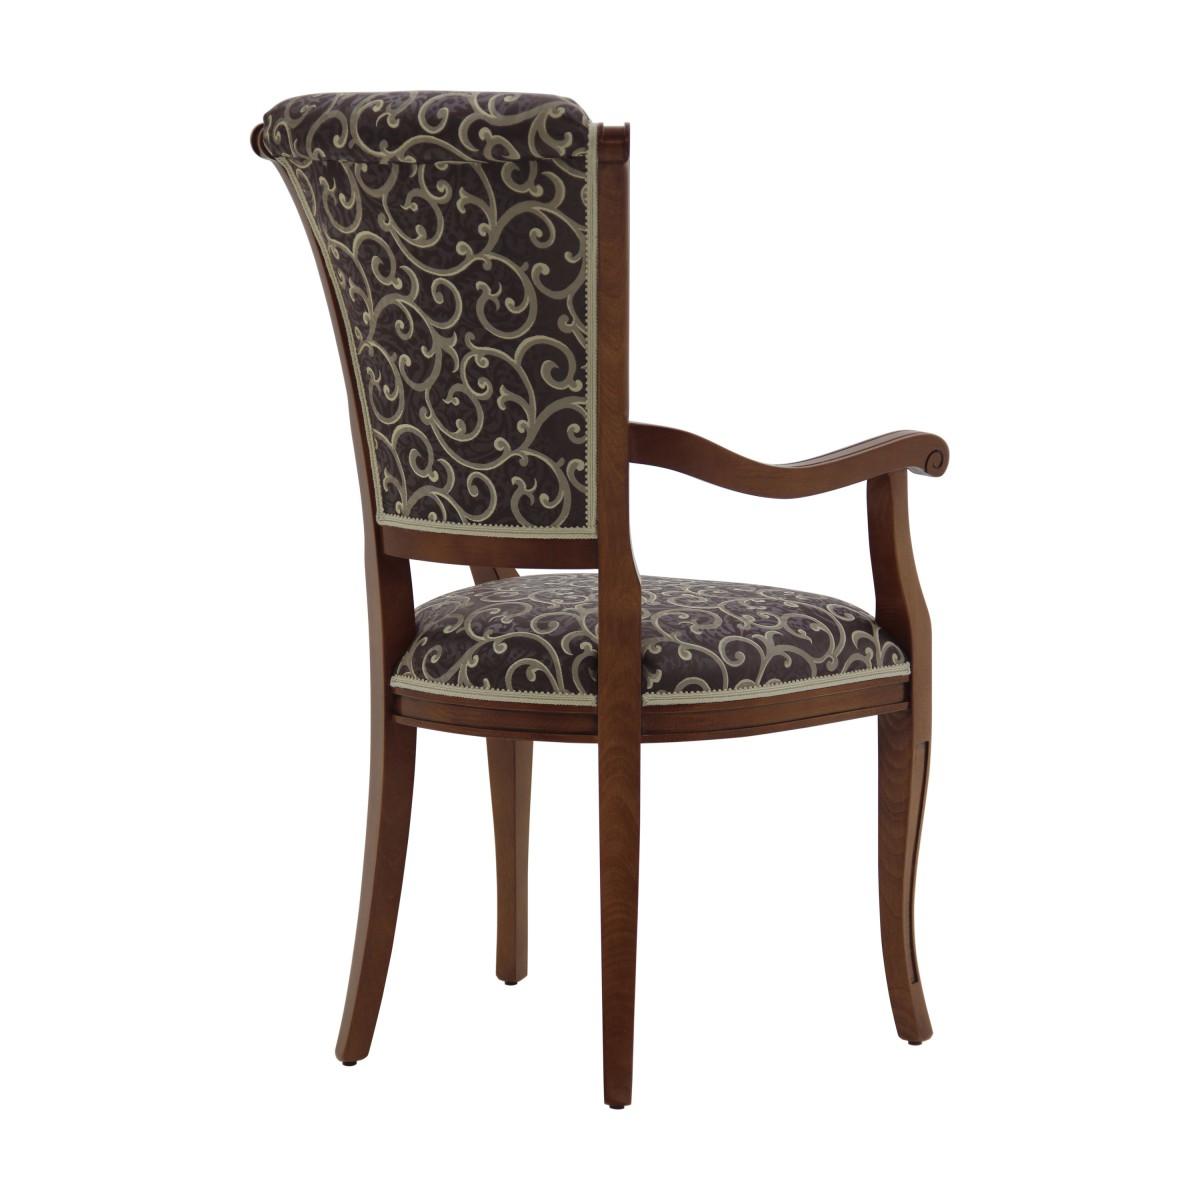 Small armchair Verona - Sevensedie